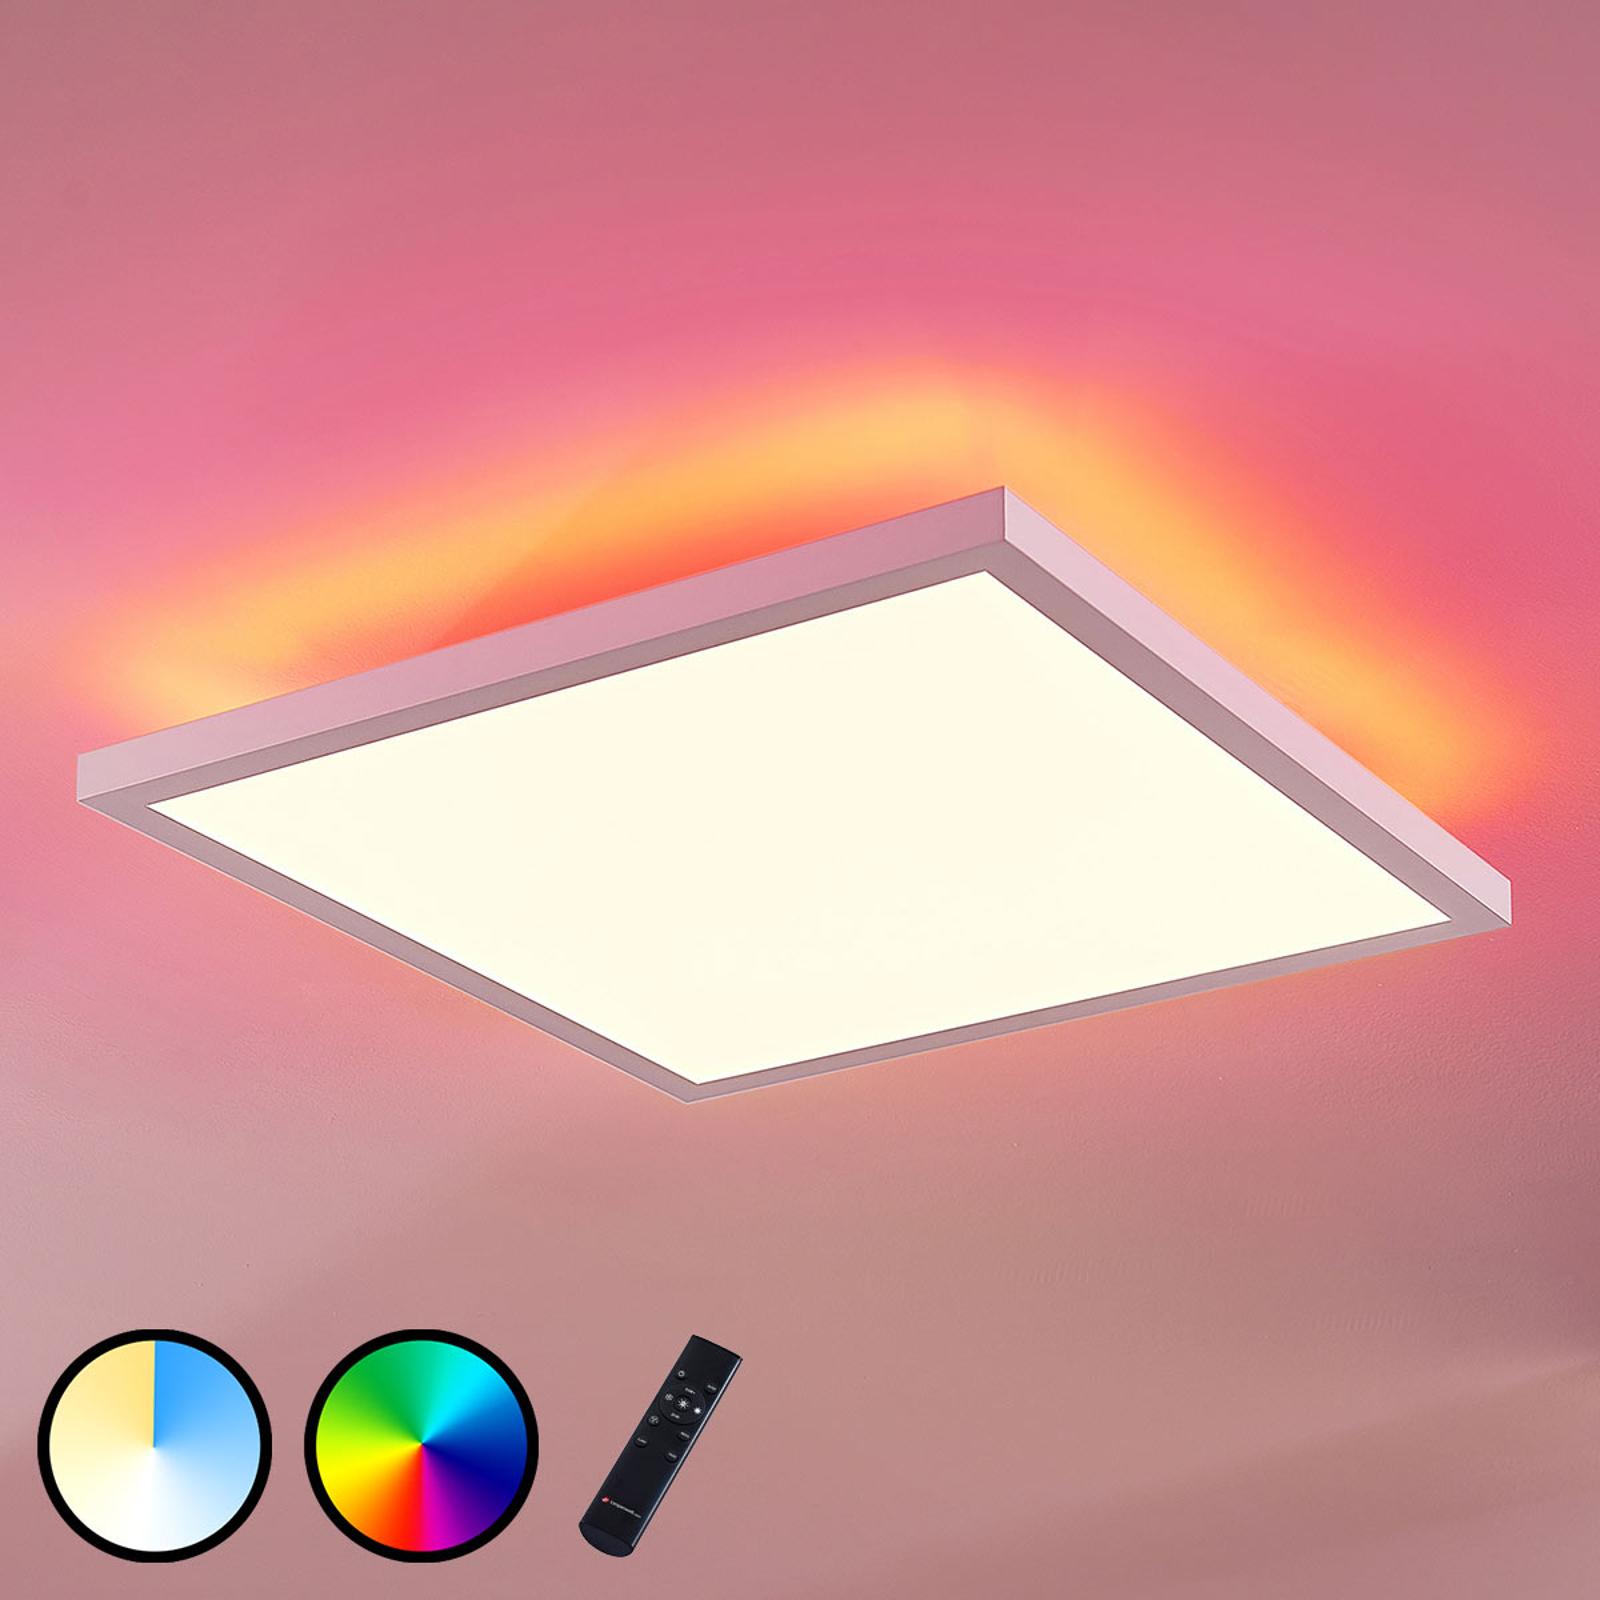 LED-Panel Brenda CCT mit Fernbedienung, 40 x 40cm